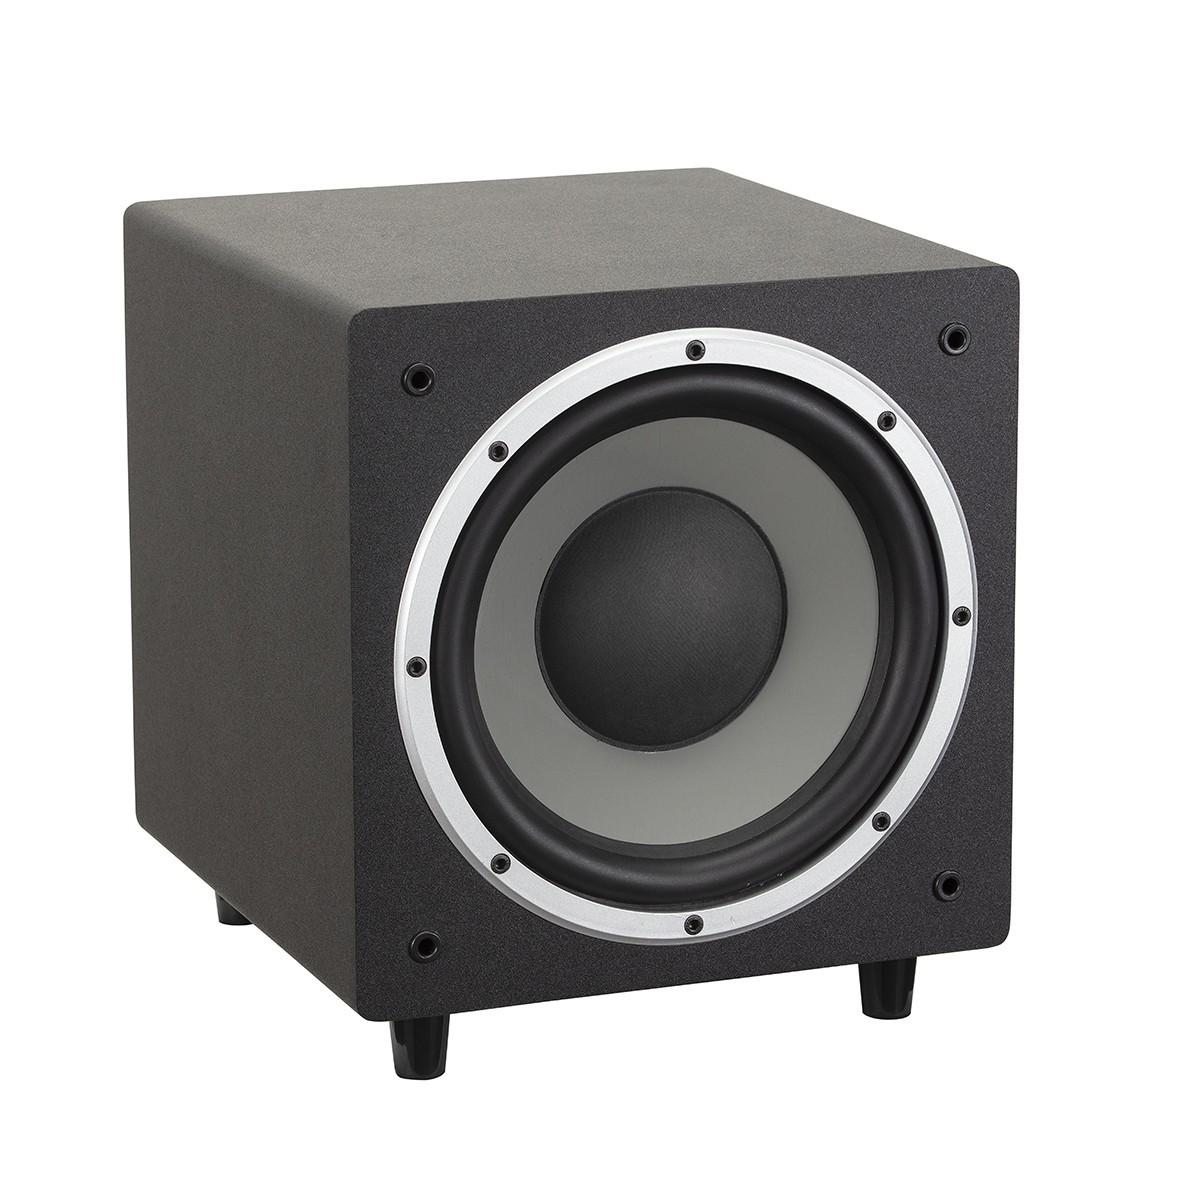 SUBWOOFER SOUNDSATION CLARITY S-10 10